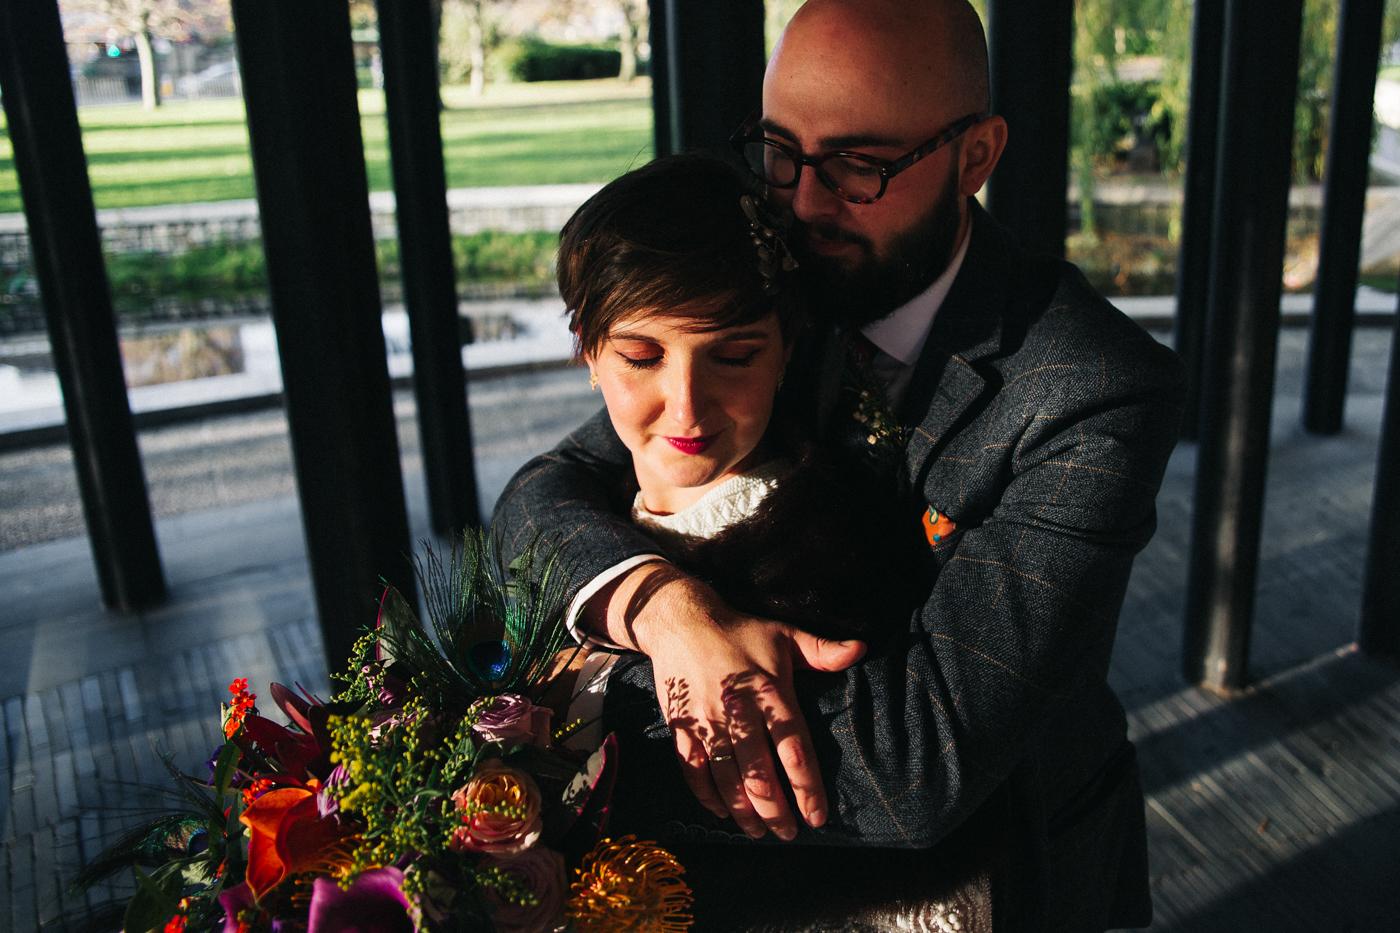 teesside-newcastle-gateshead-wedding-photography-photographer-creative-0052.jpg